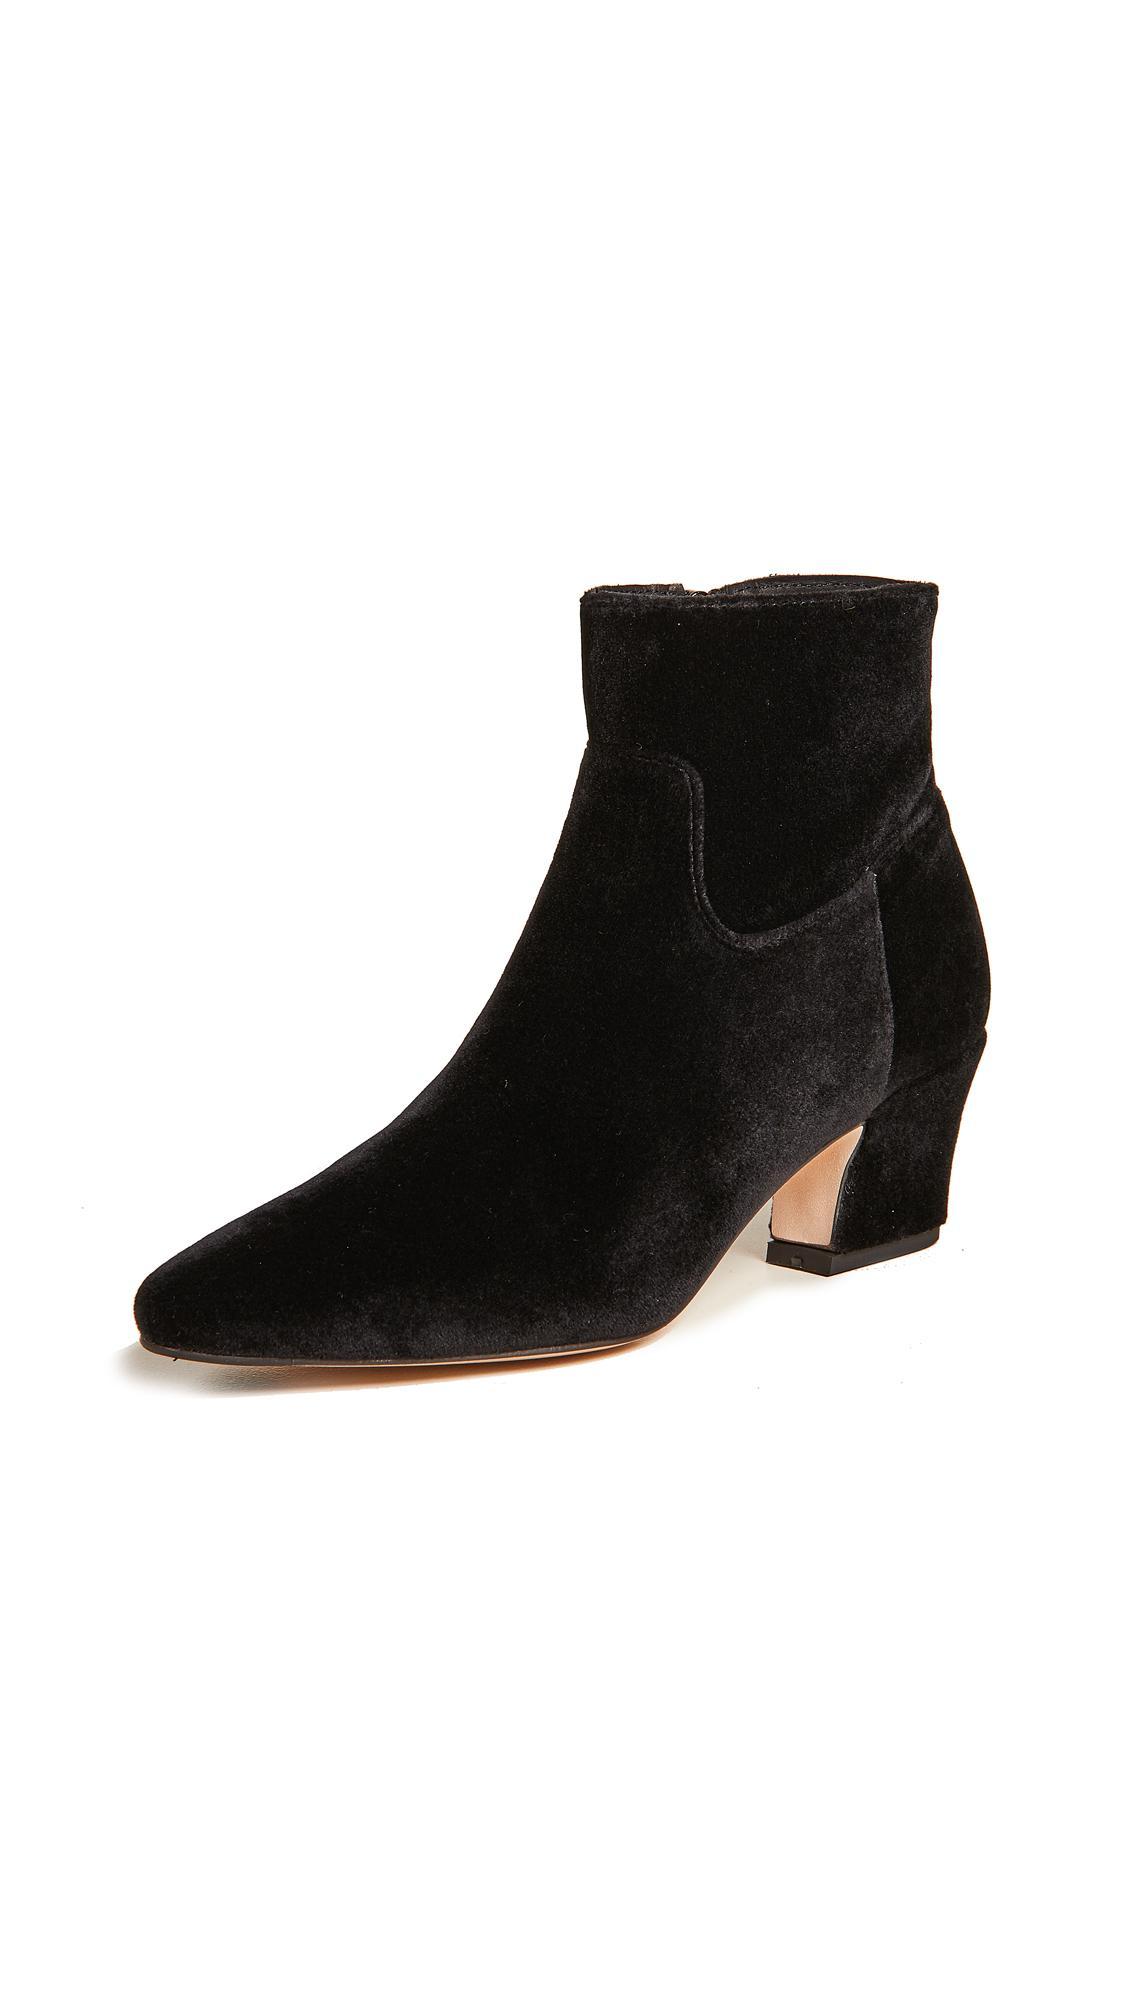 Miista Lorelle Black Velvet Ankle Boots